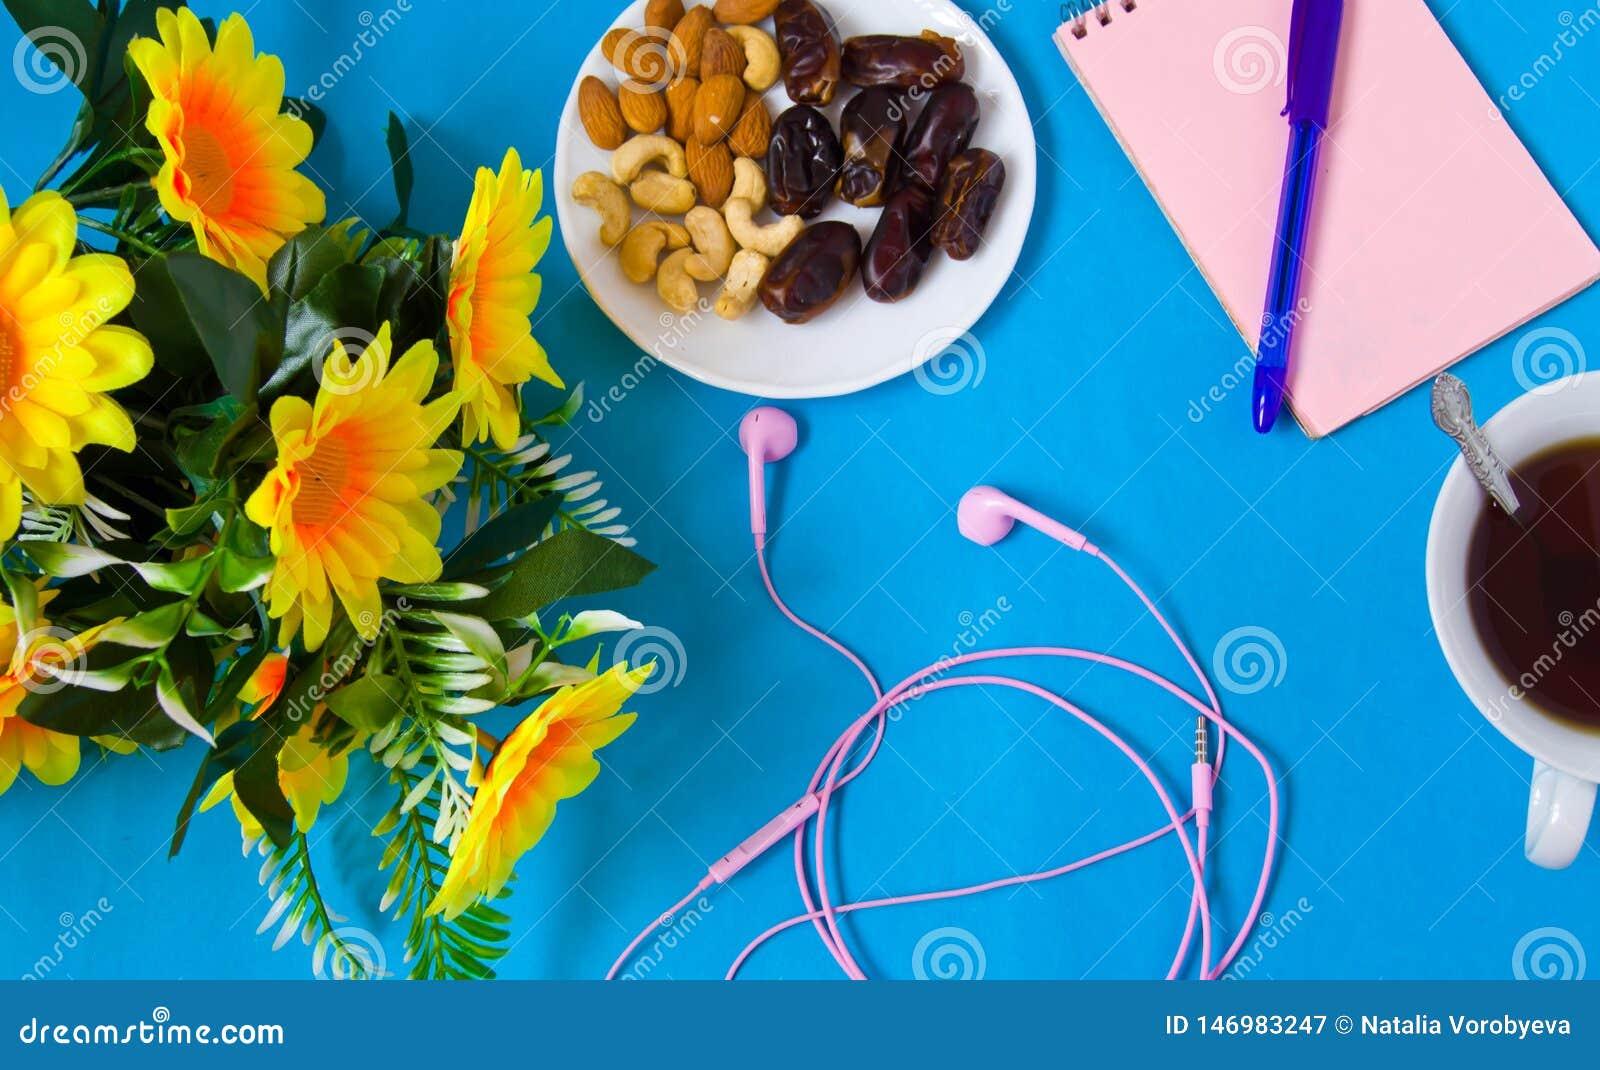 Carnet, stylo, fleurs, lieu de travail femelle